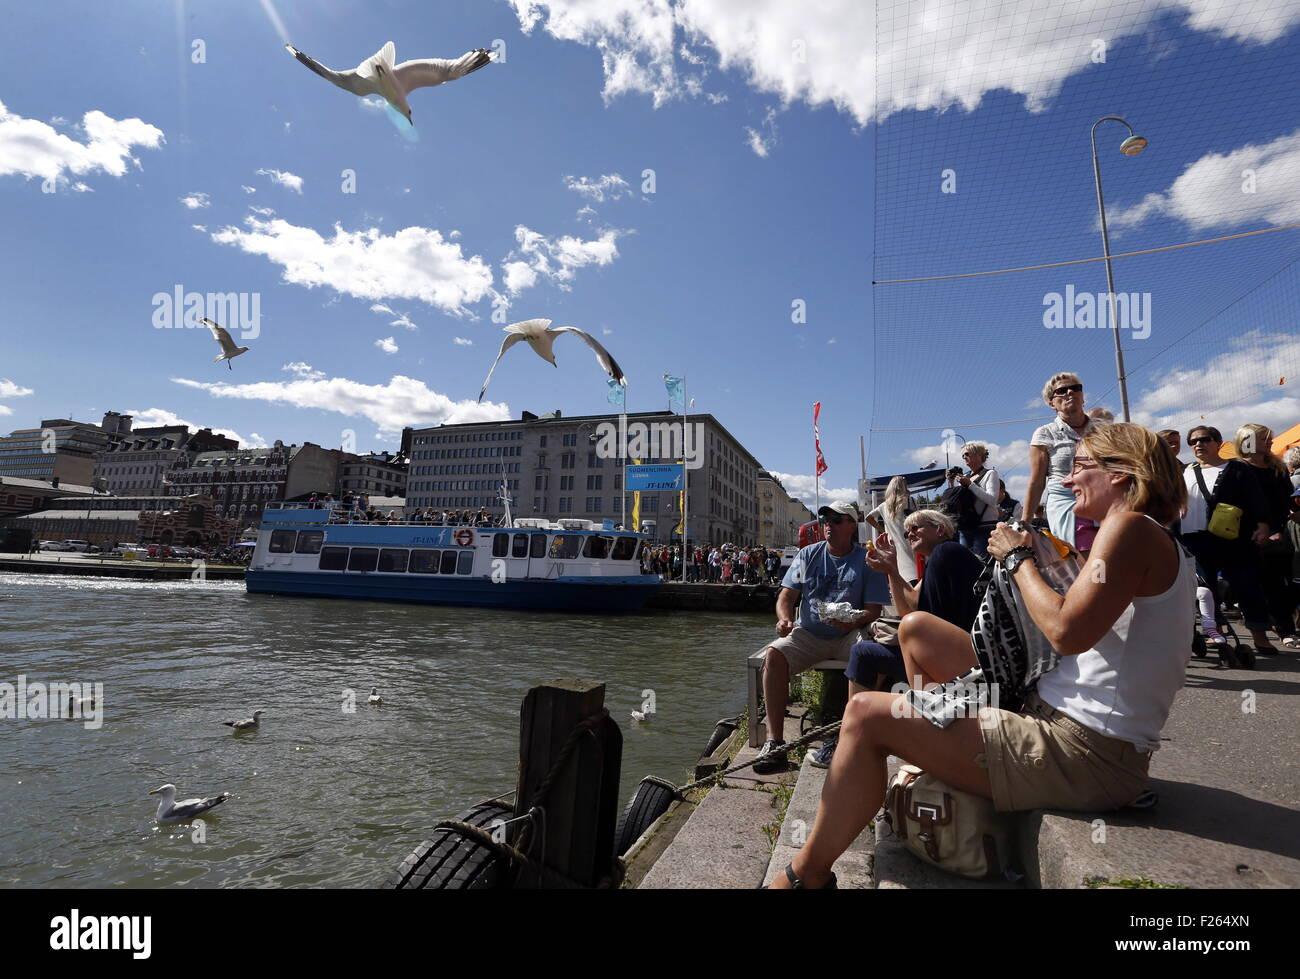 Helsinki, Finland. 1st Aug, 2015. People feeding seagulls . © Valery Matytsin/TASS/Alamy Live News - Stock Image